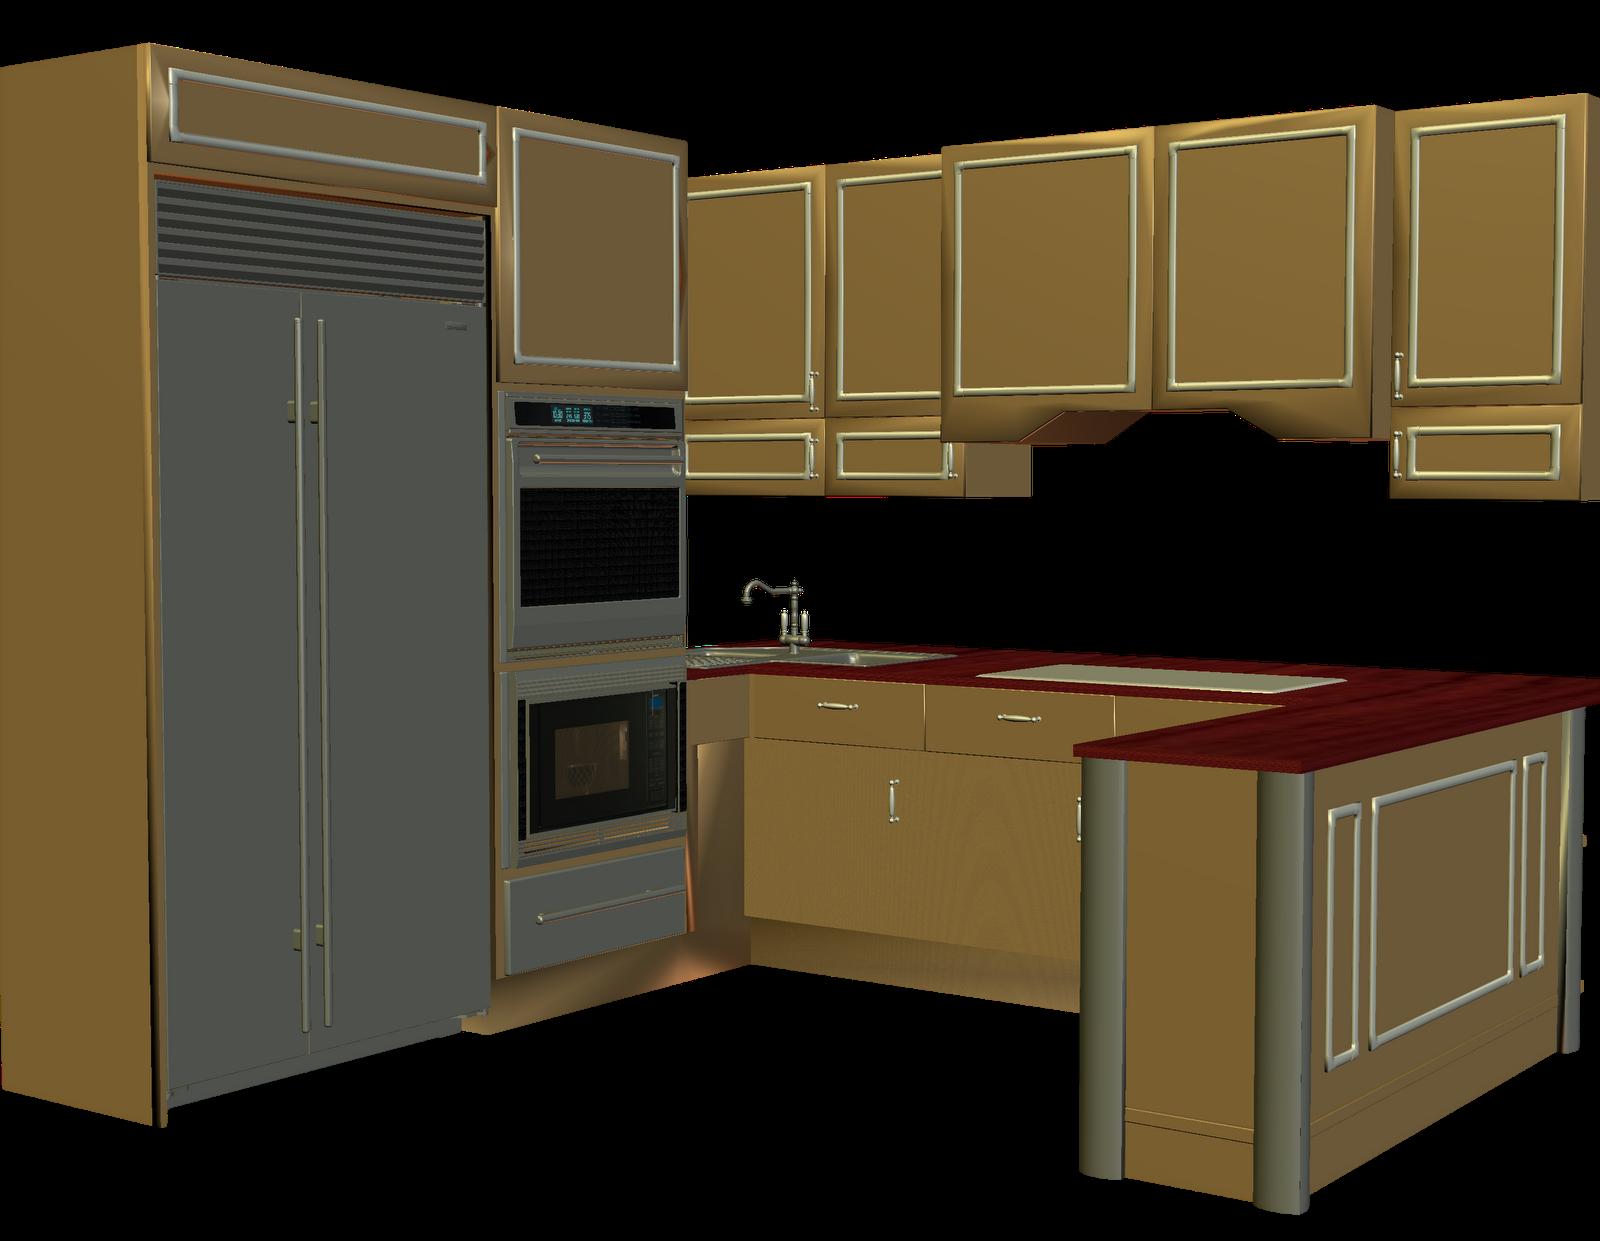 kitchen clipart kitchen design